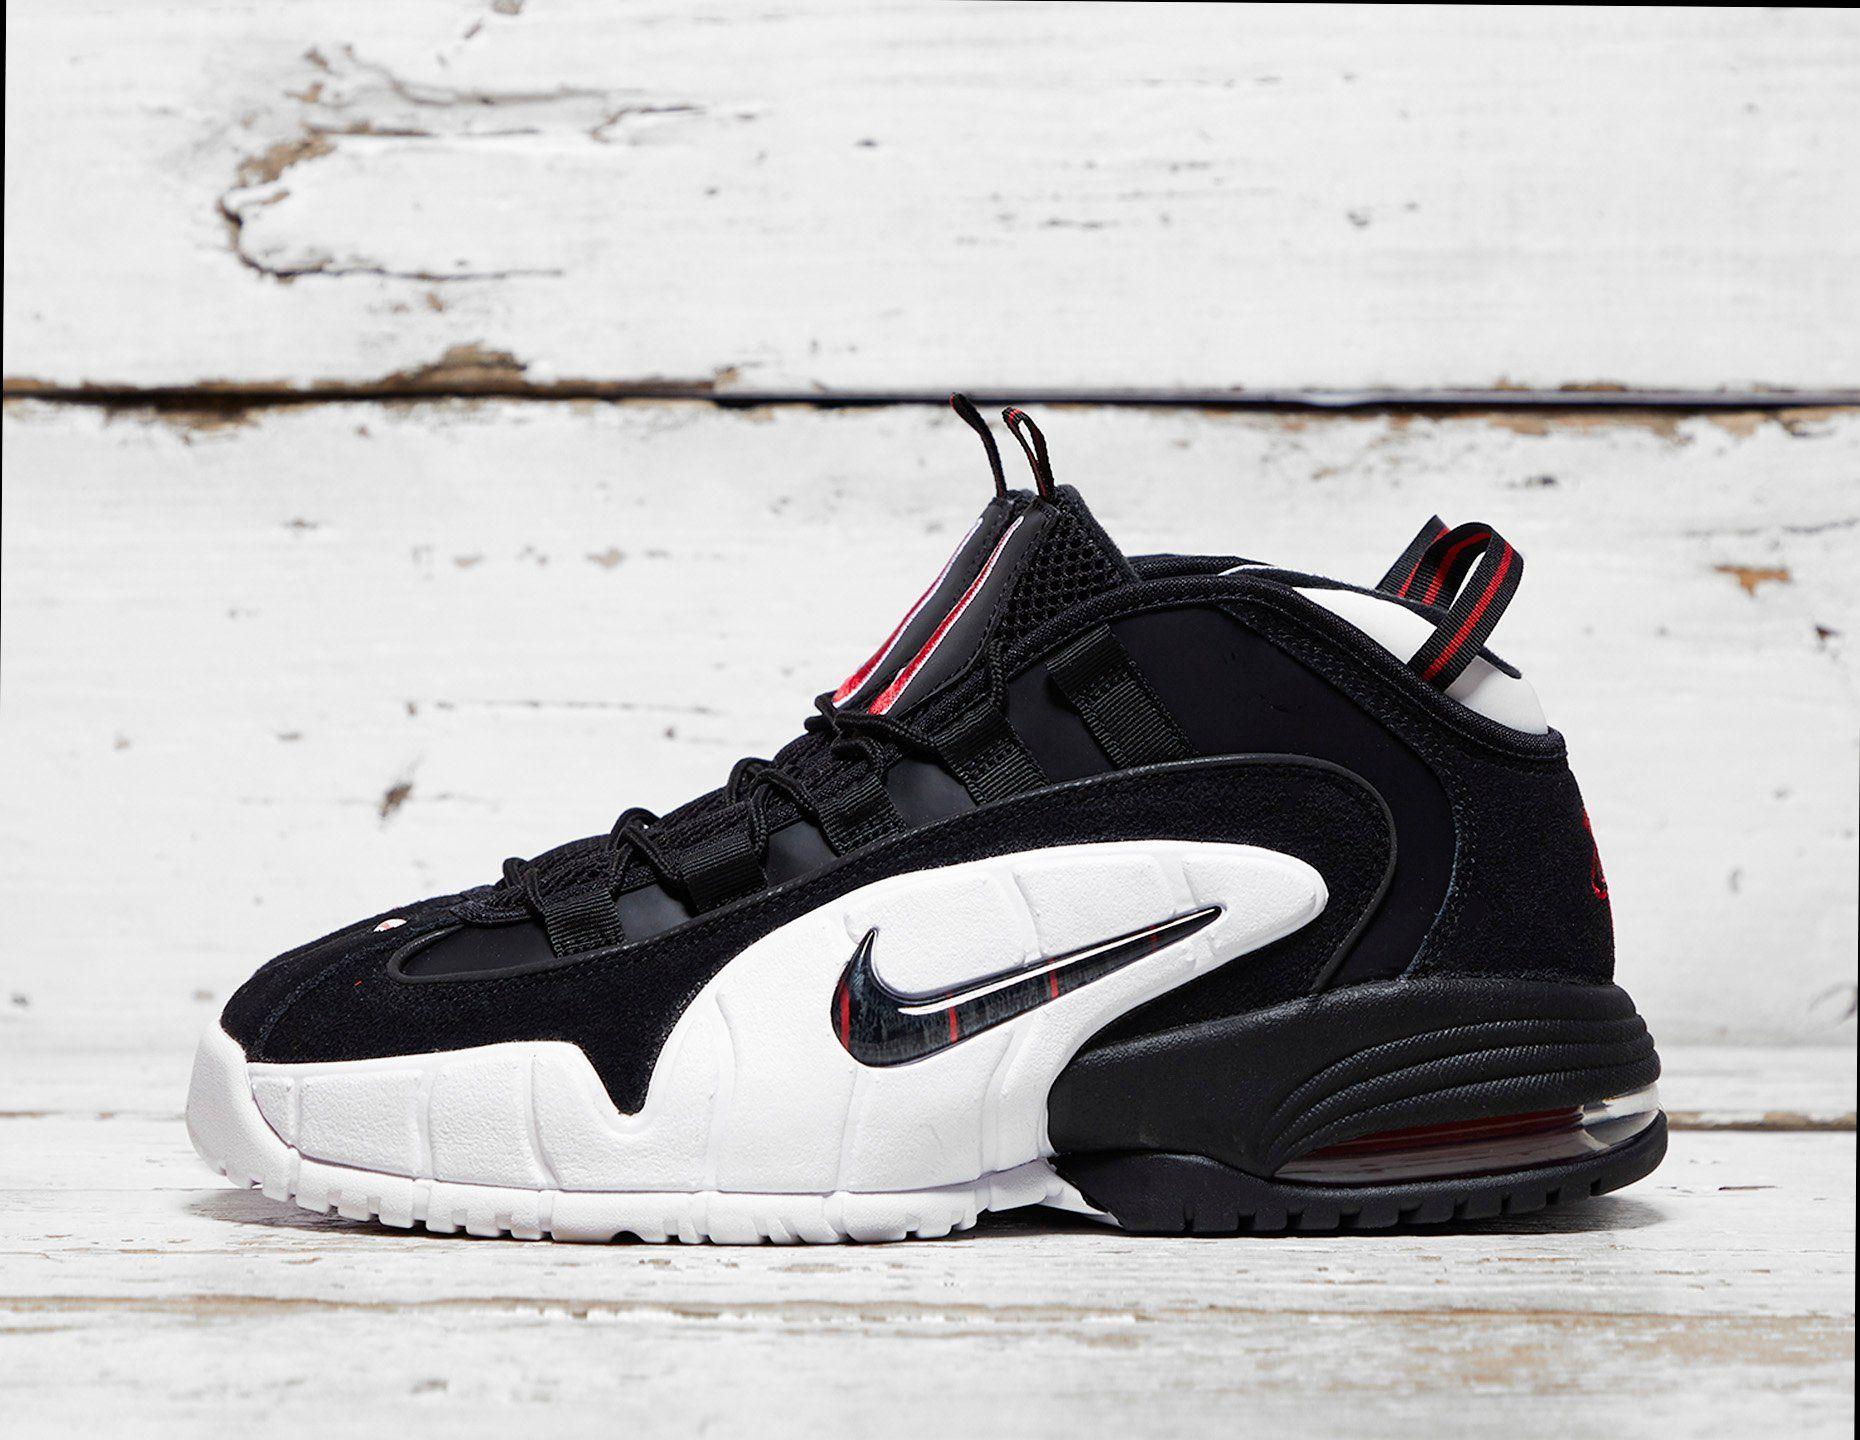 Nike Air Max Penny